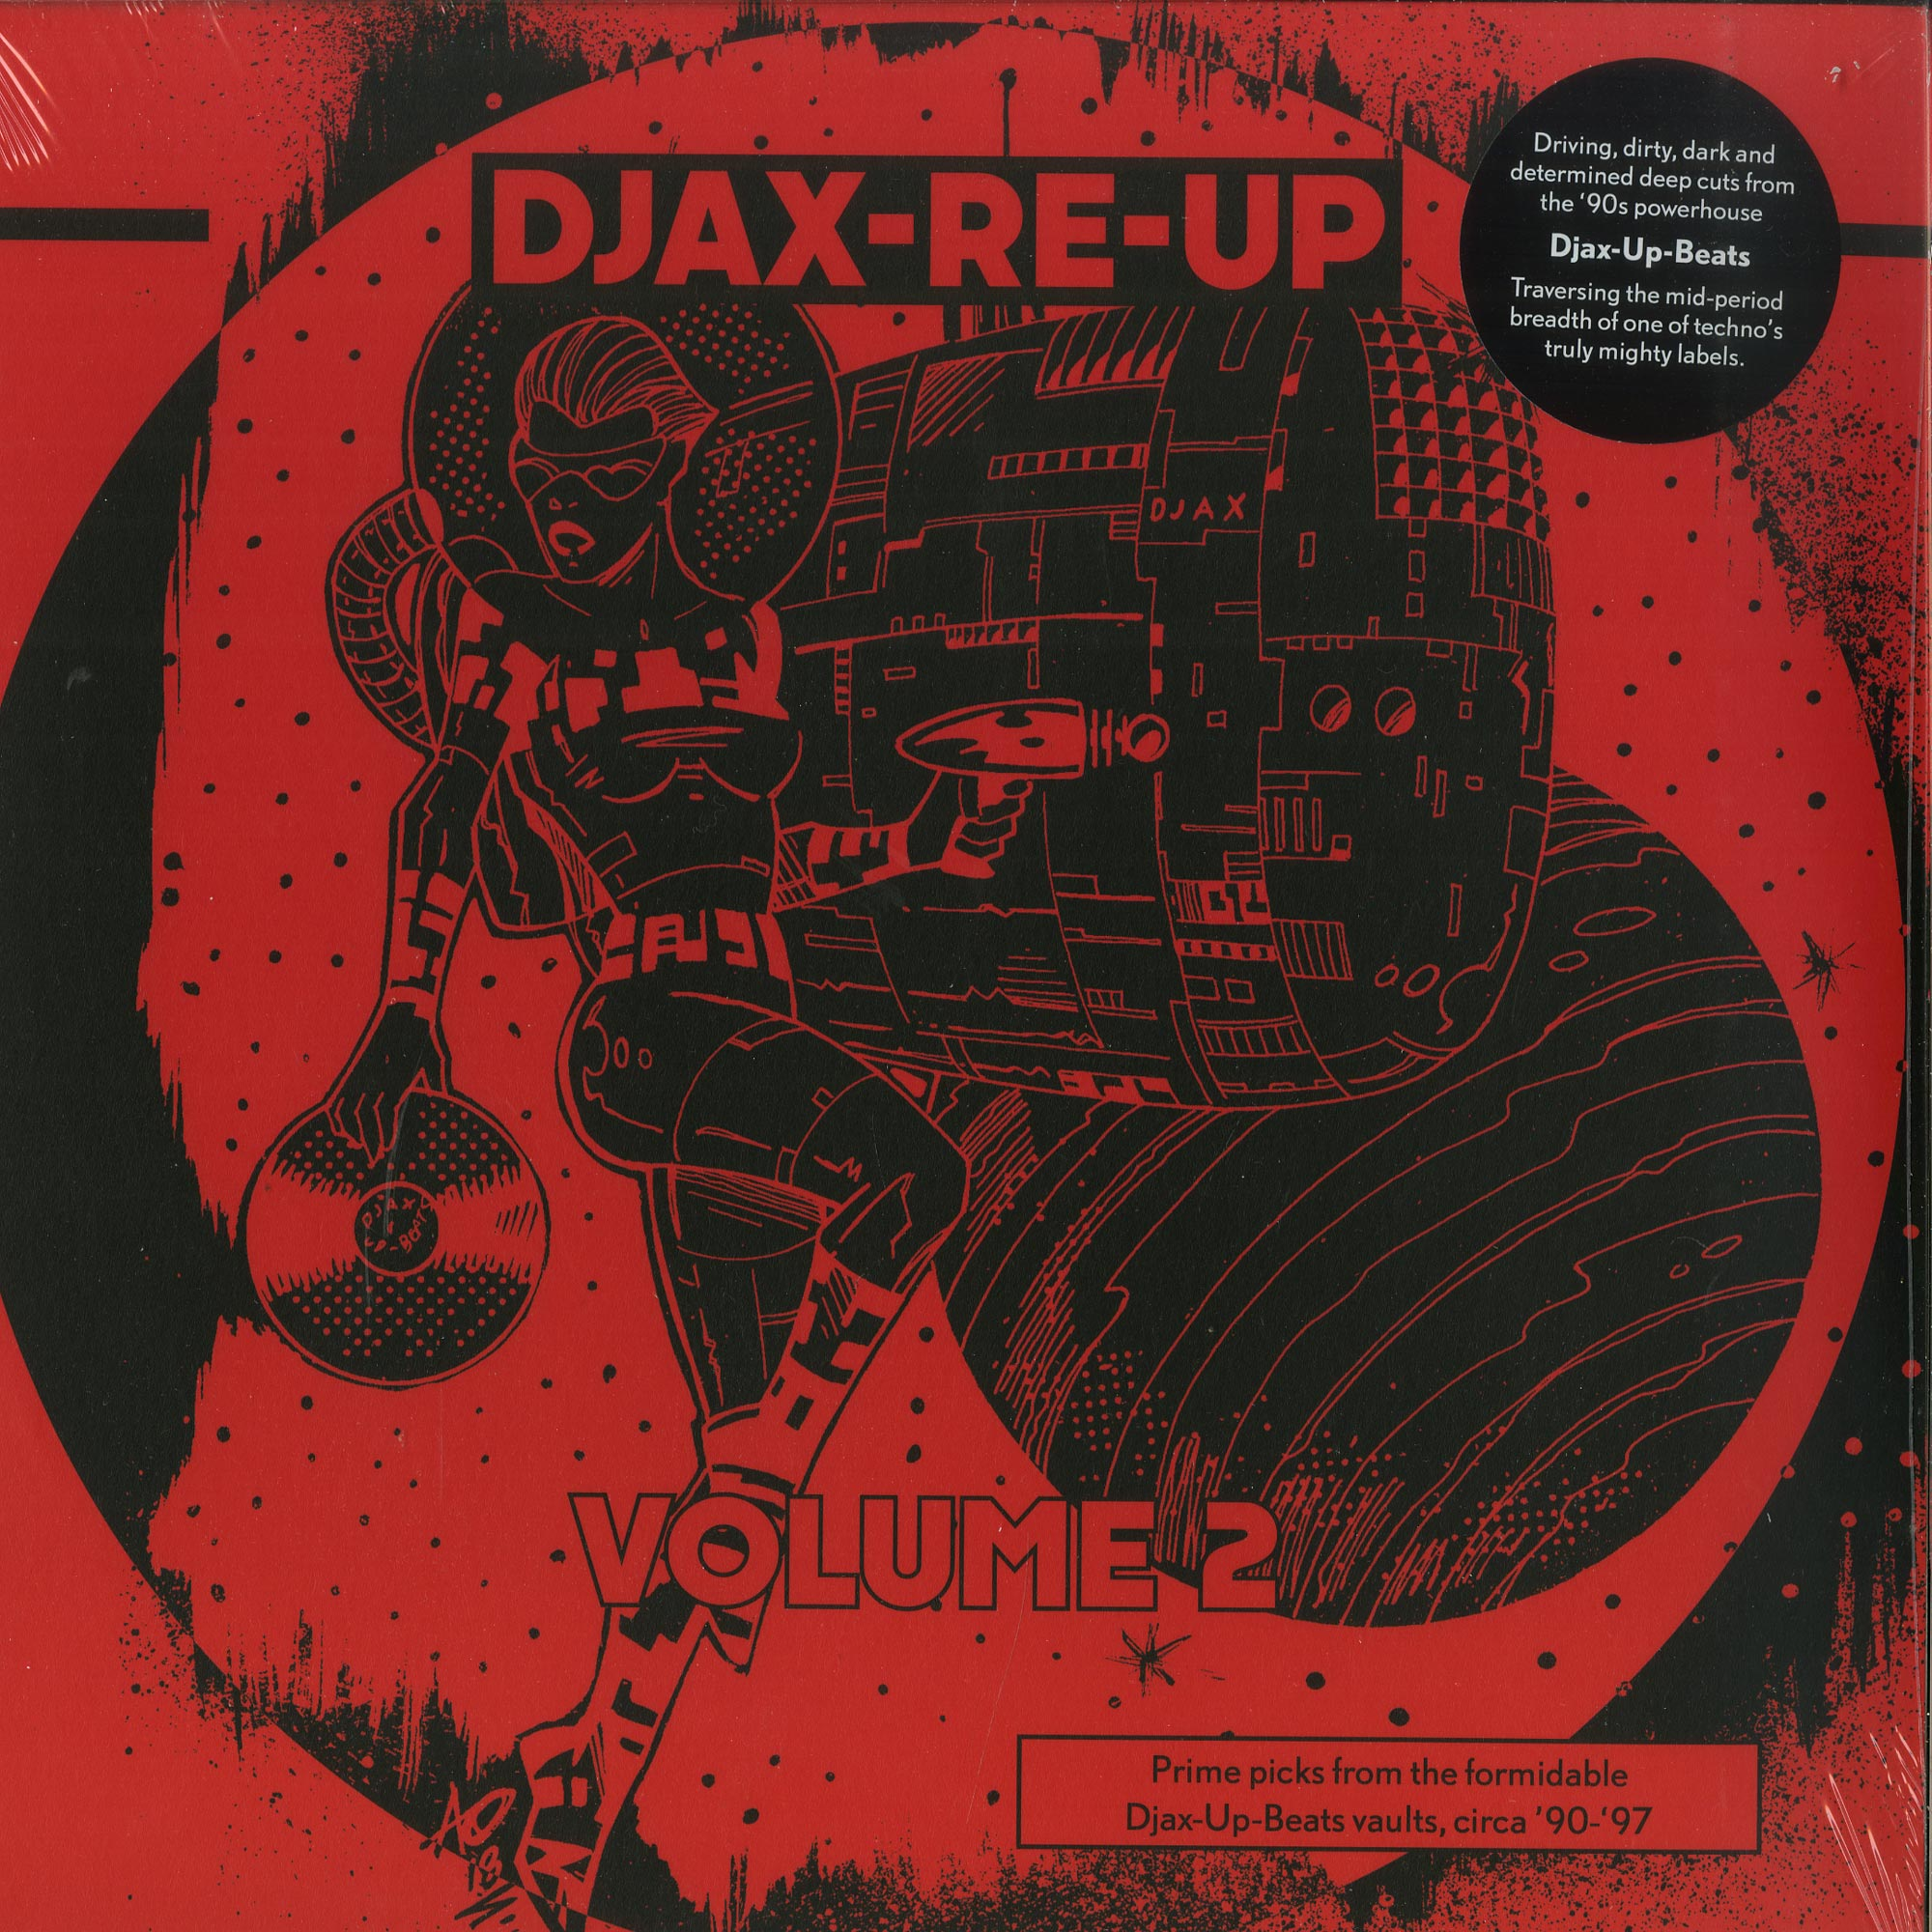 V/a - DJAX-RE-UP VOLUME 2